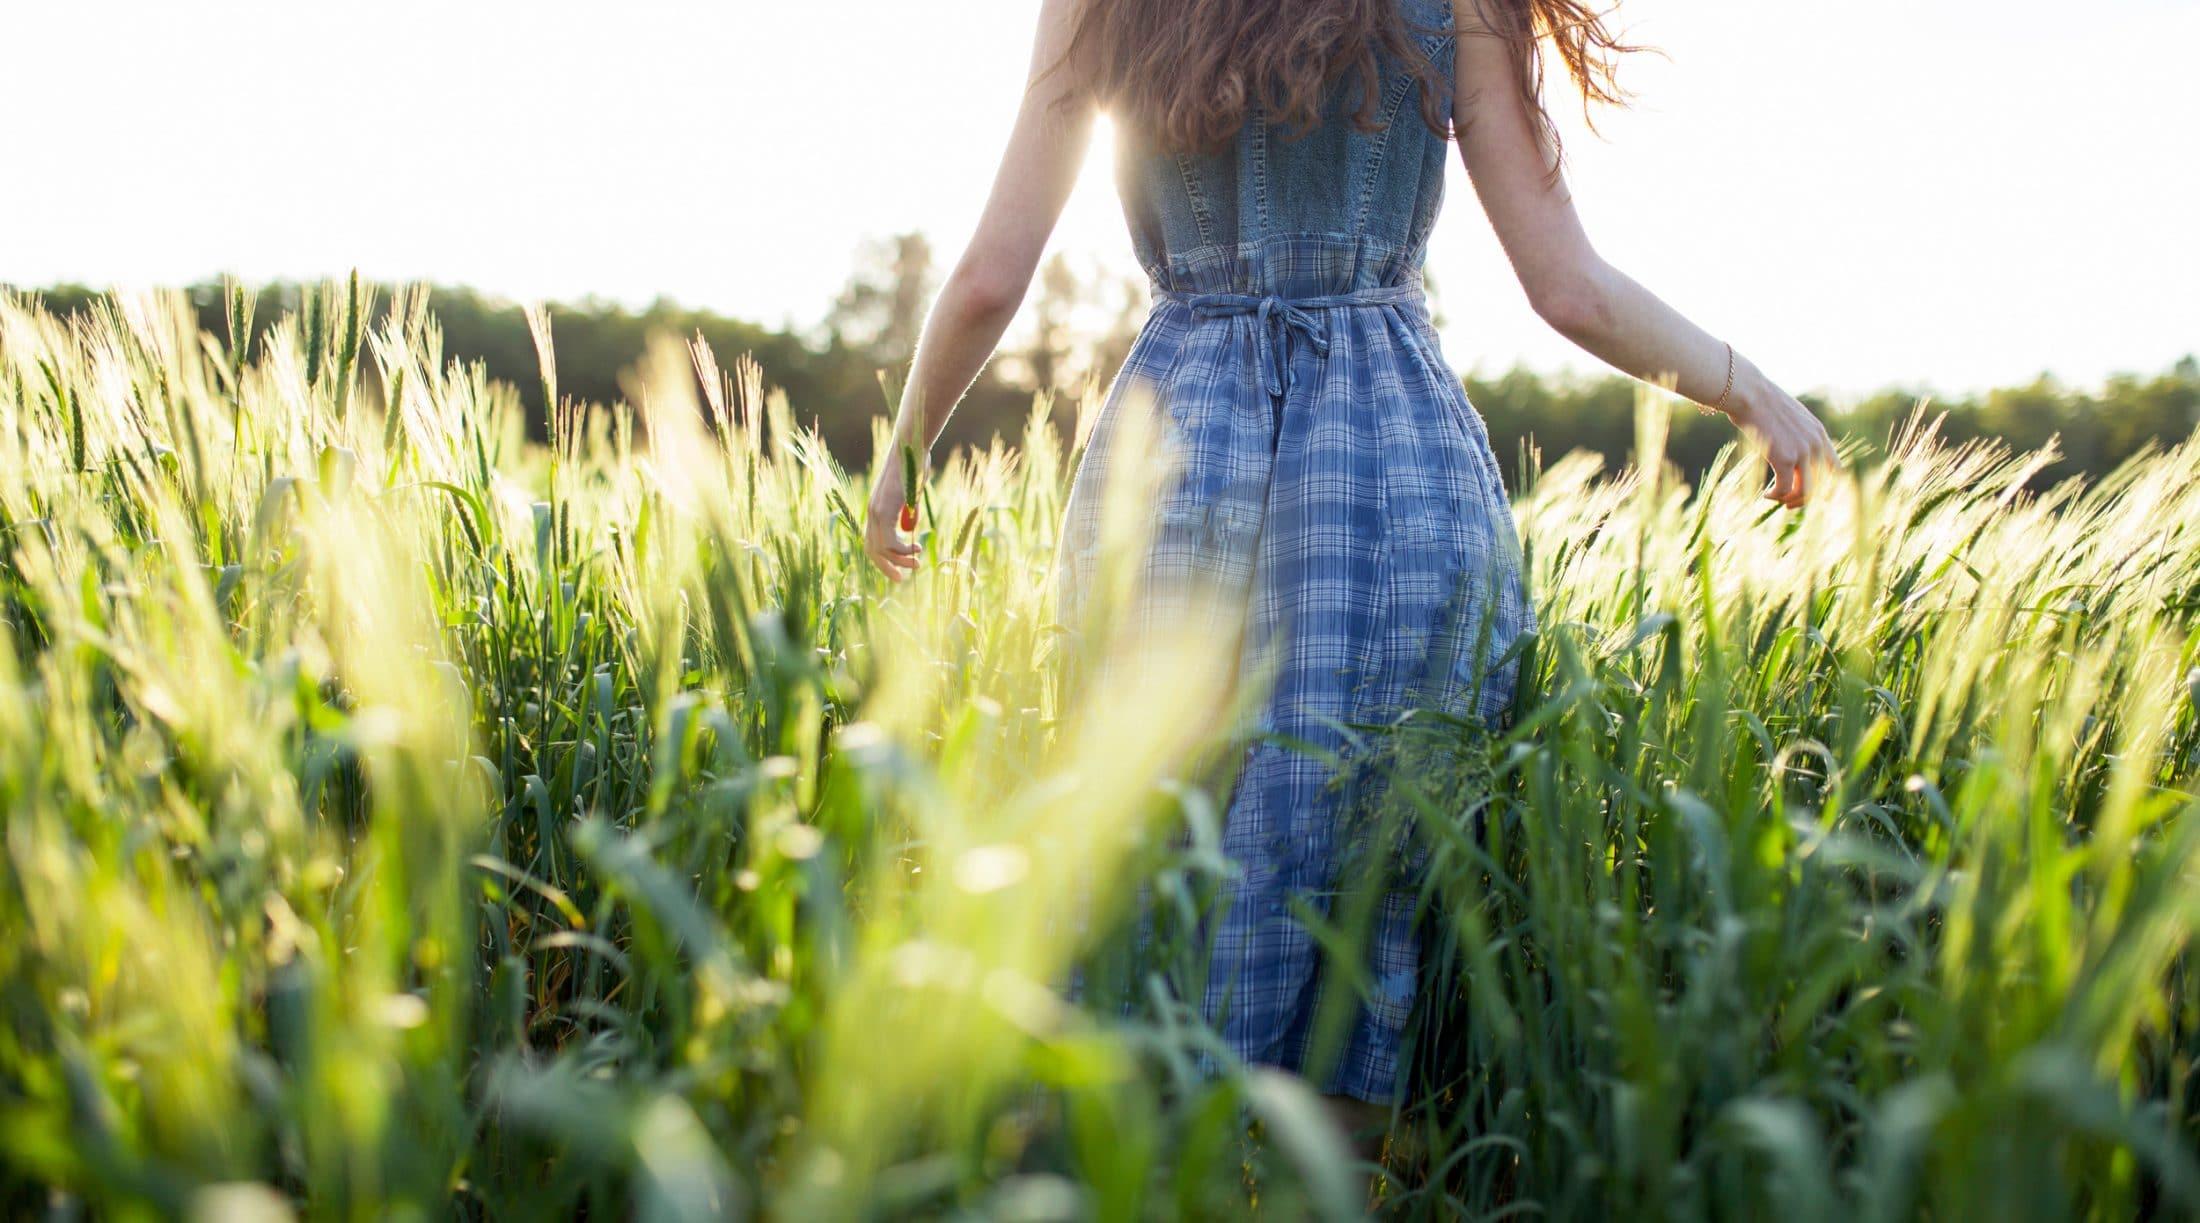 A woman with energy strolling in a field, enjoying fresh air